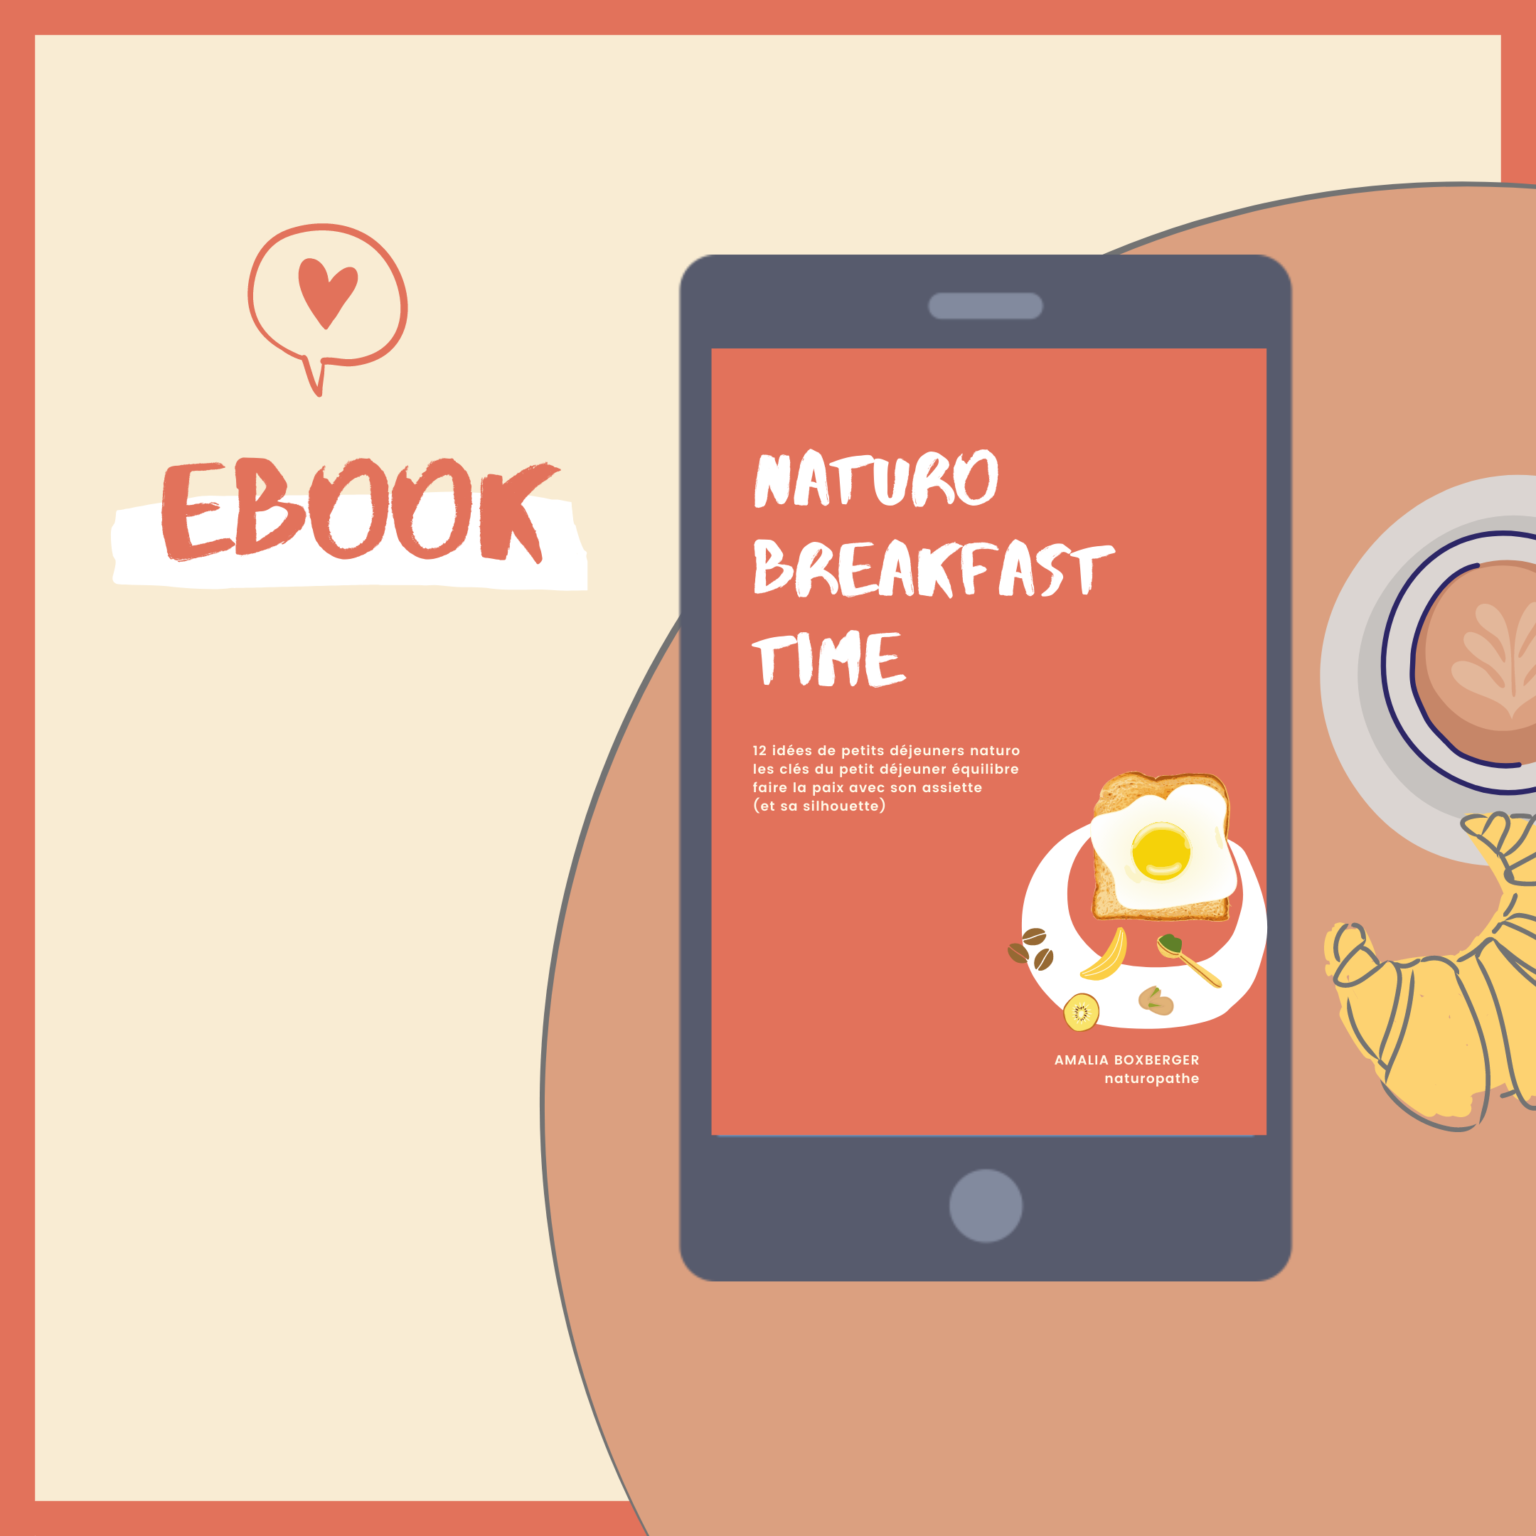 EBOOK Naturo Breakfast Time